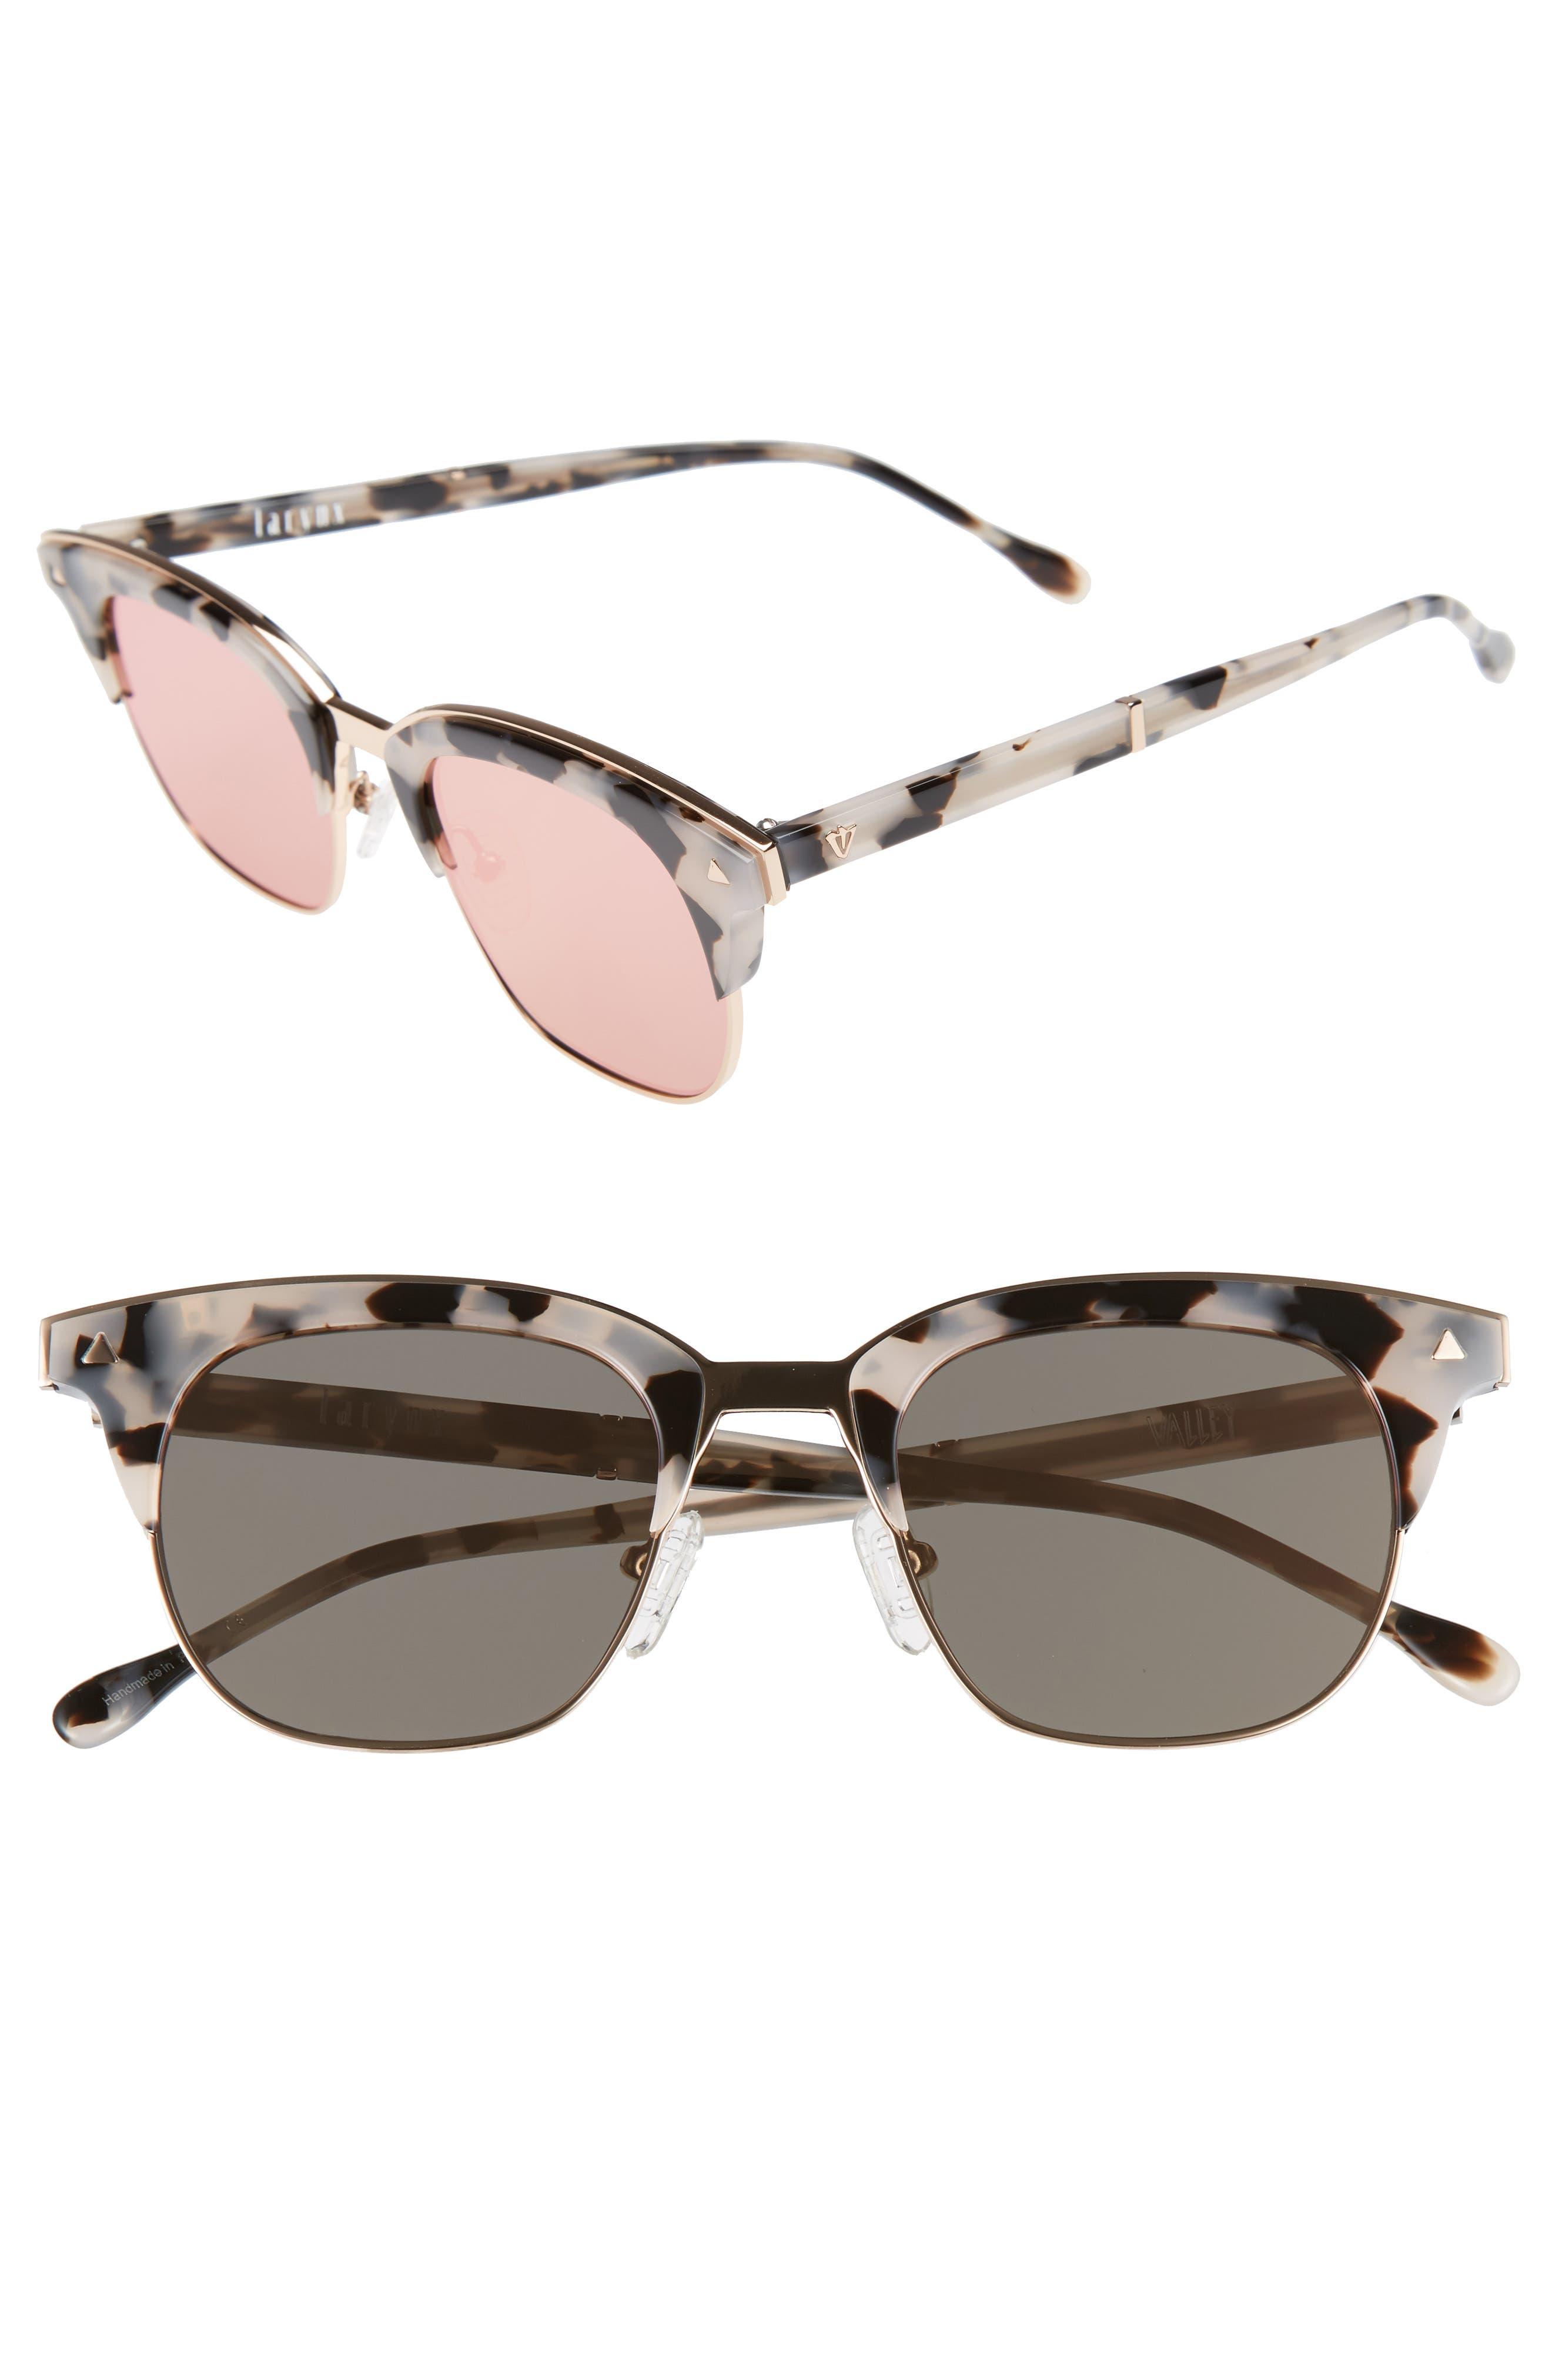 VALLEY Larynx 47mm Retro Sunglasses